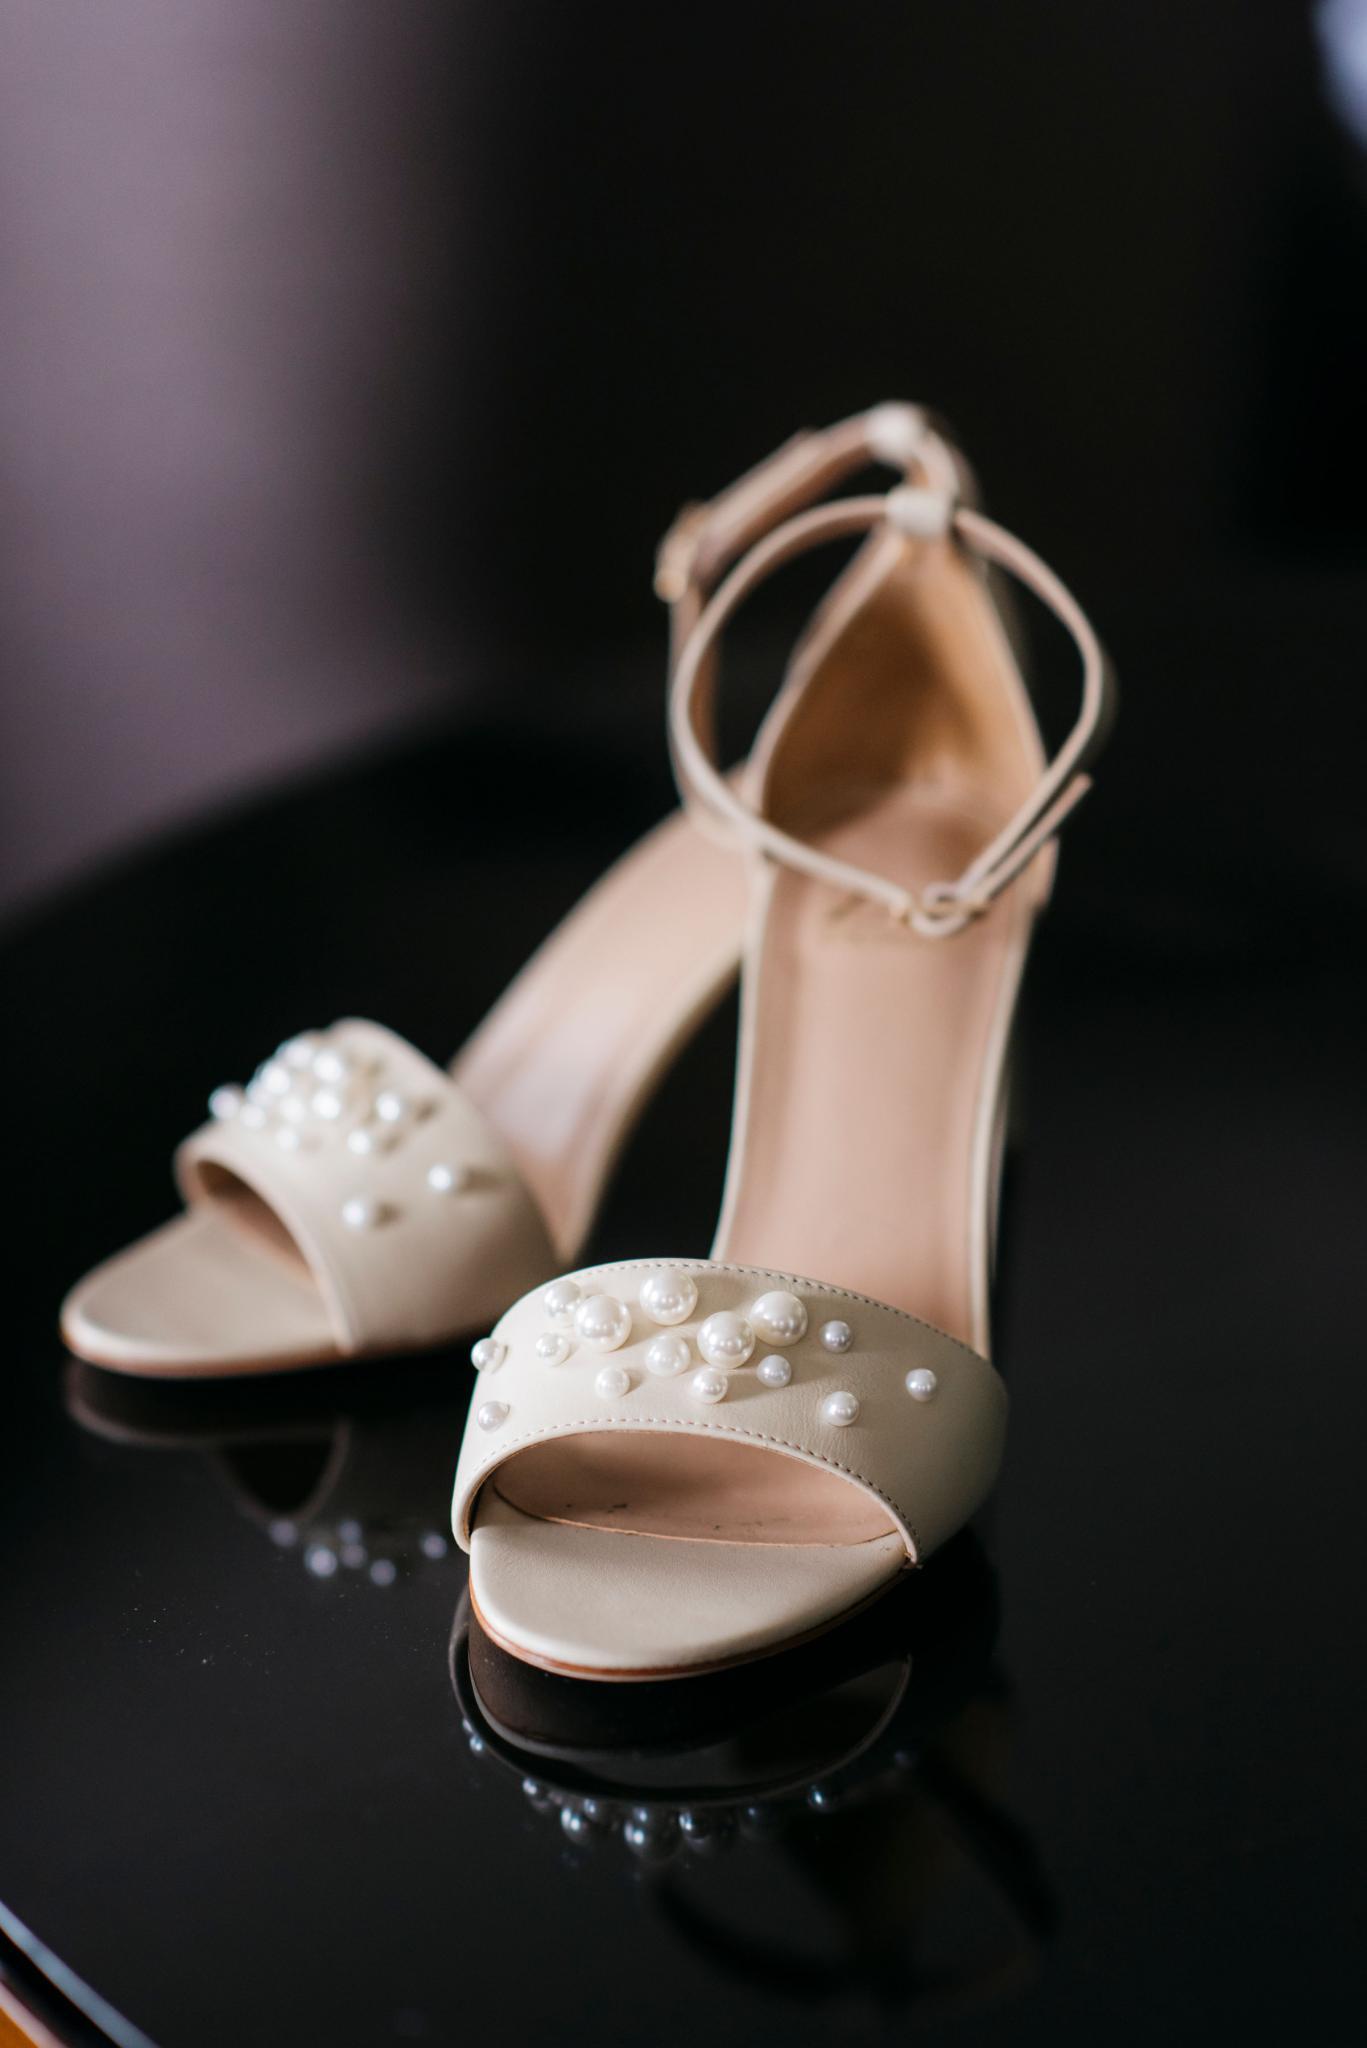 annie tommy venue SIX10 chicago, il wedding bridal shoes